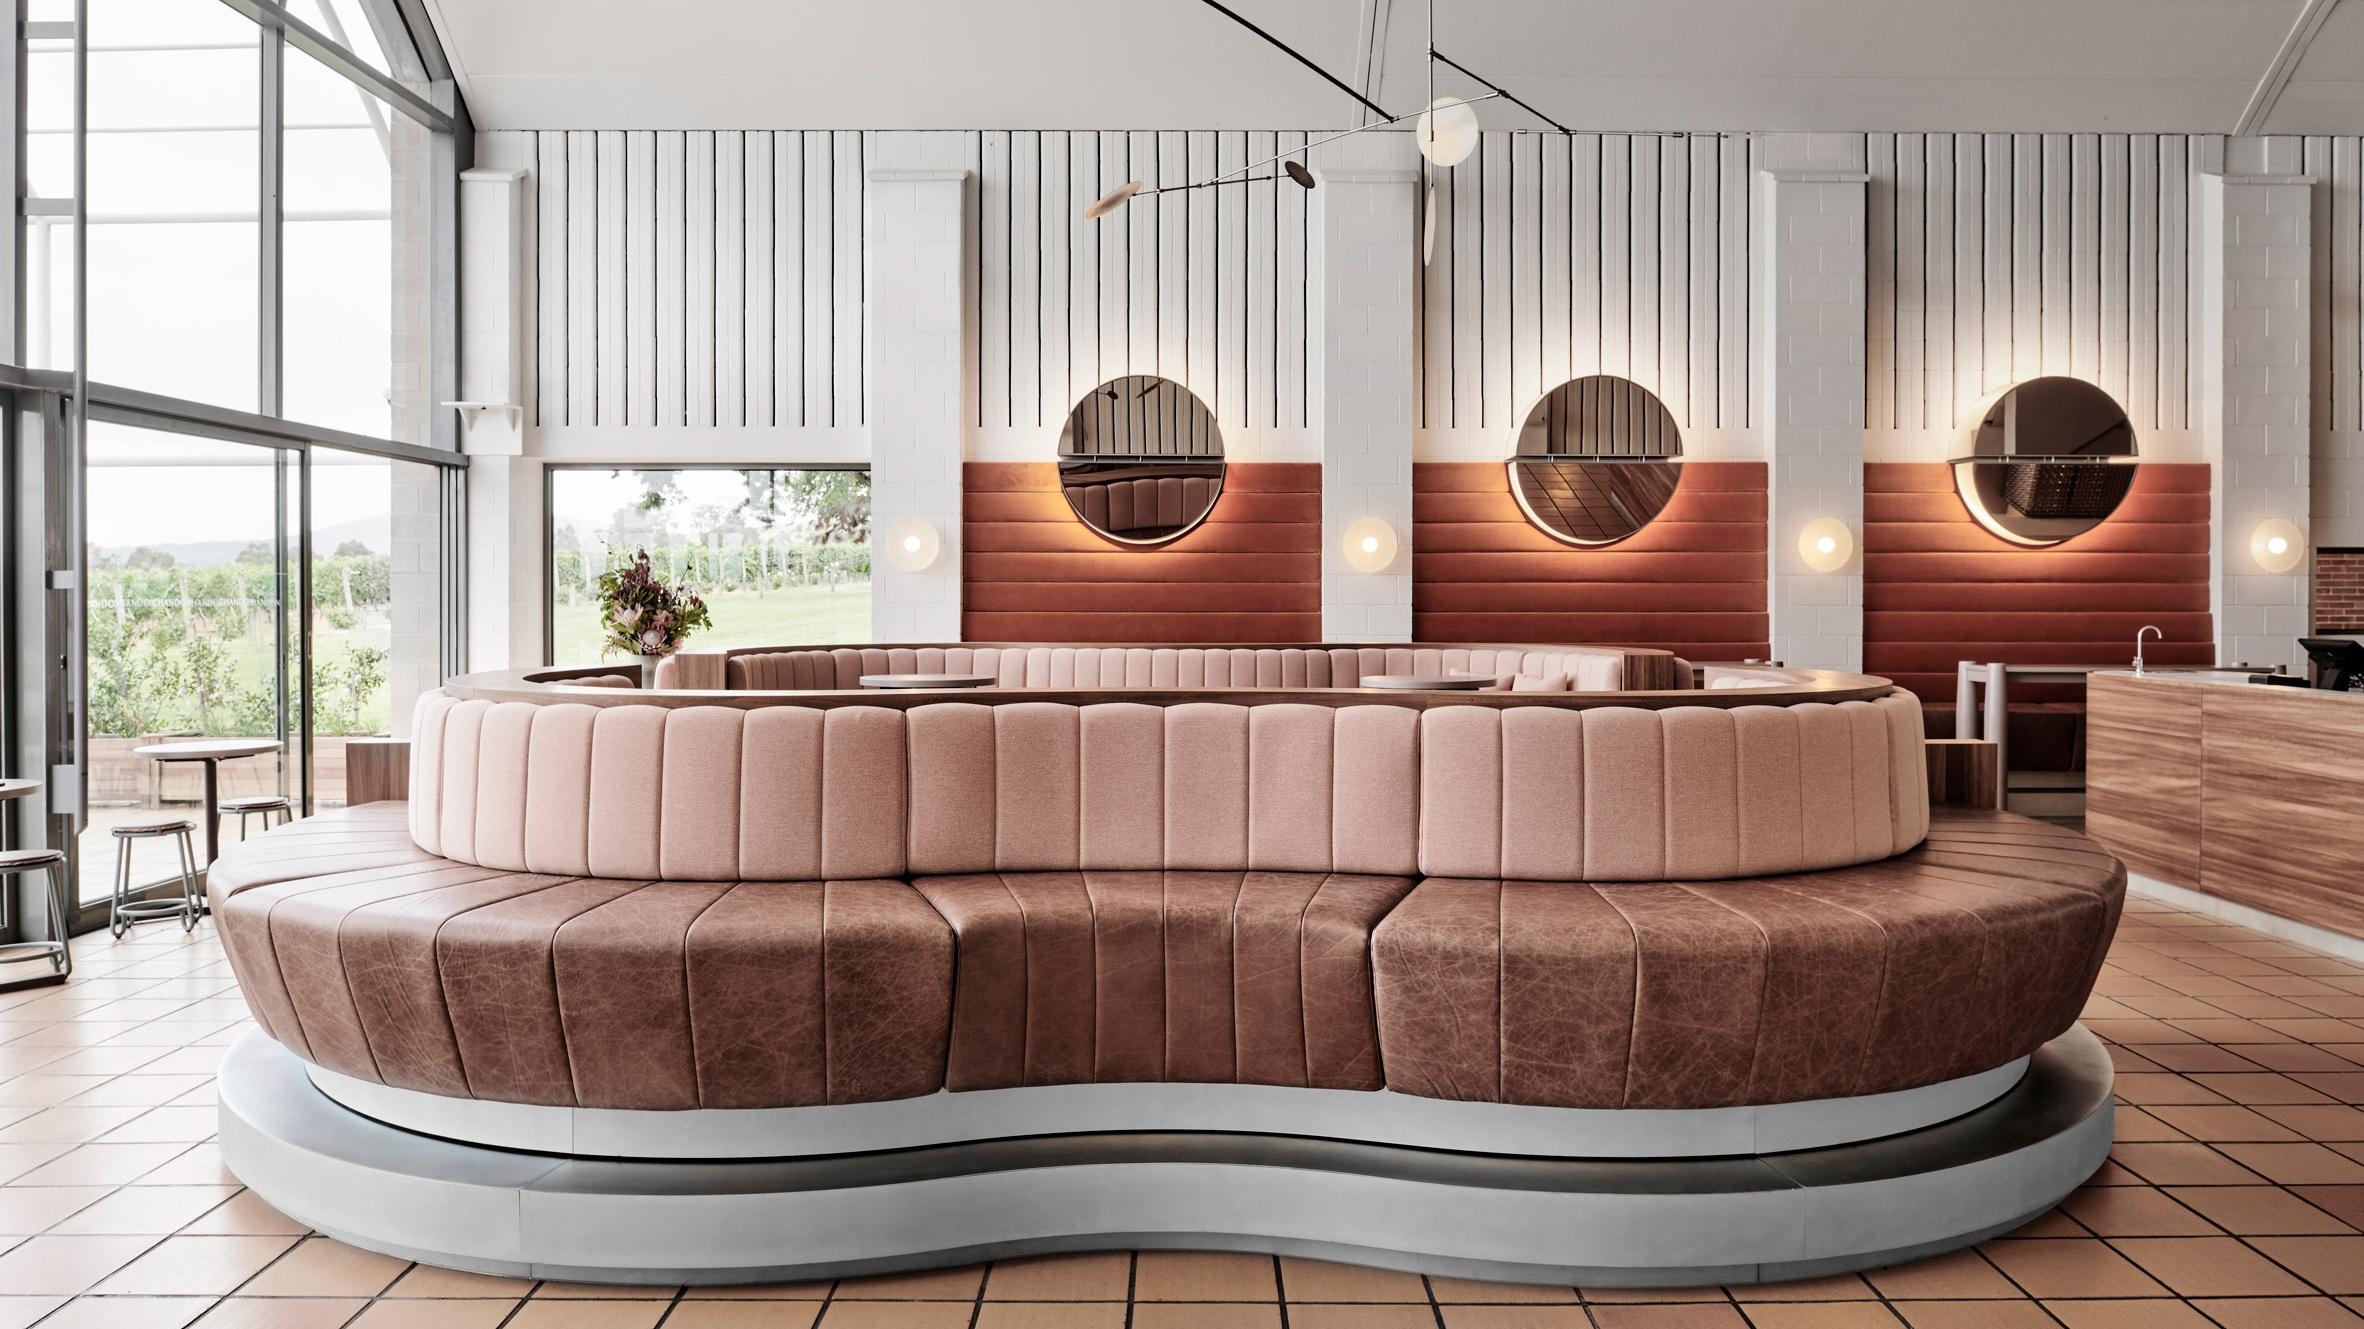 chandon-foolscap-studio-pocketspace-restaurant-inspiration-hospitality